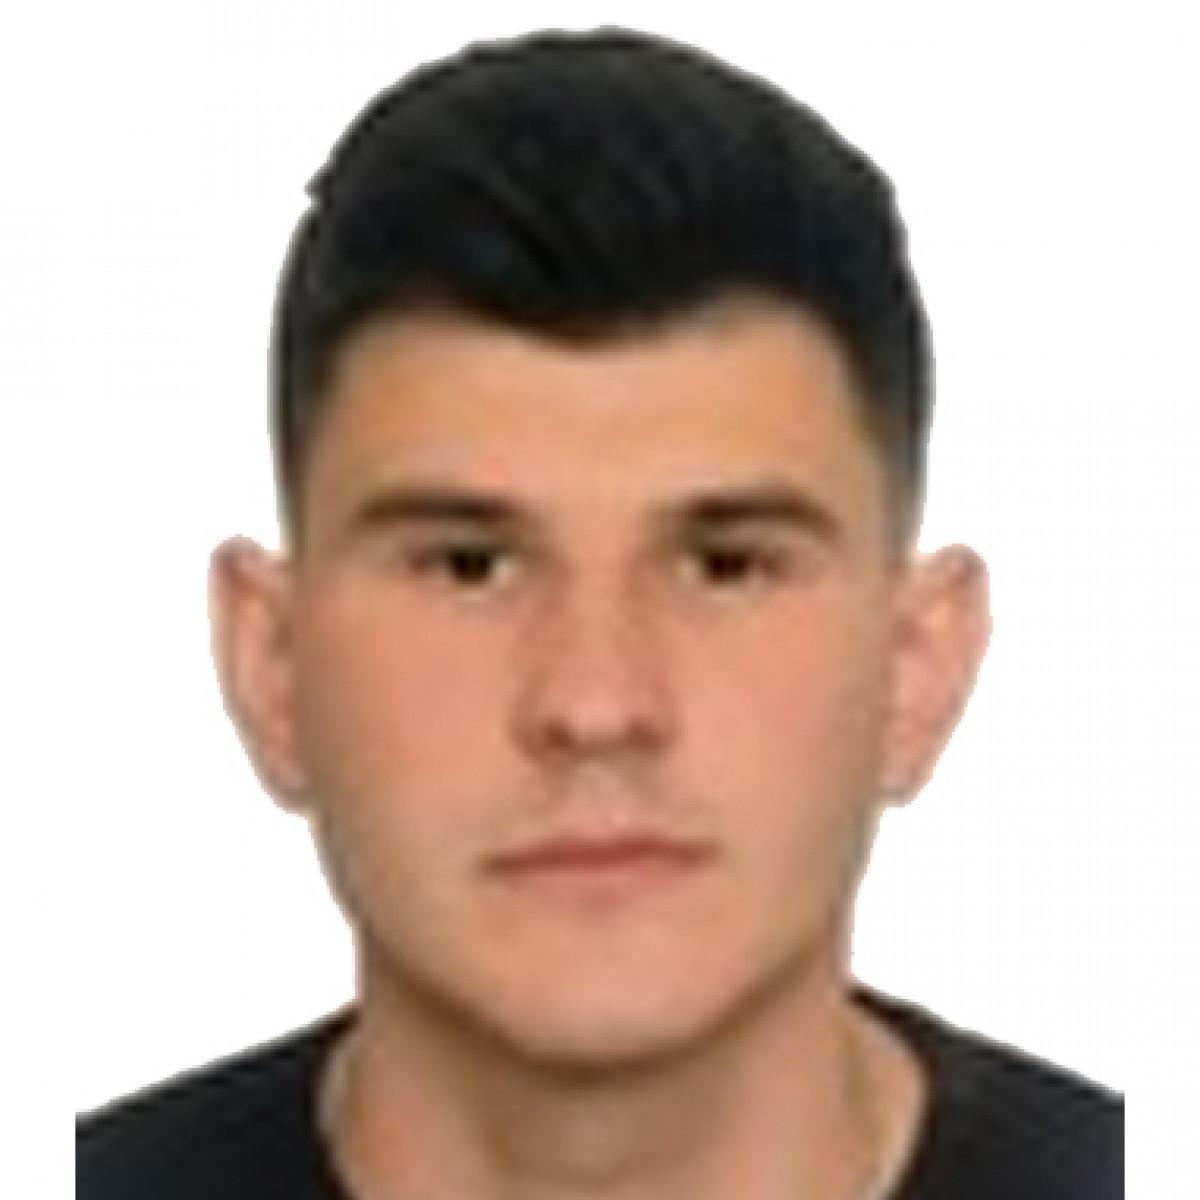 Alexandr Lavnik